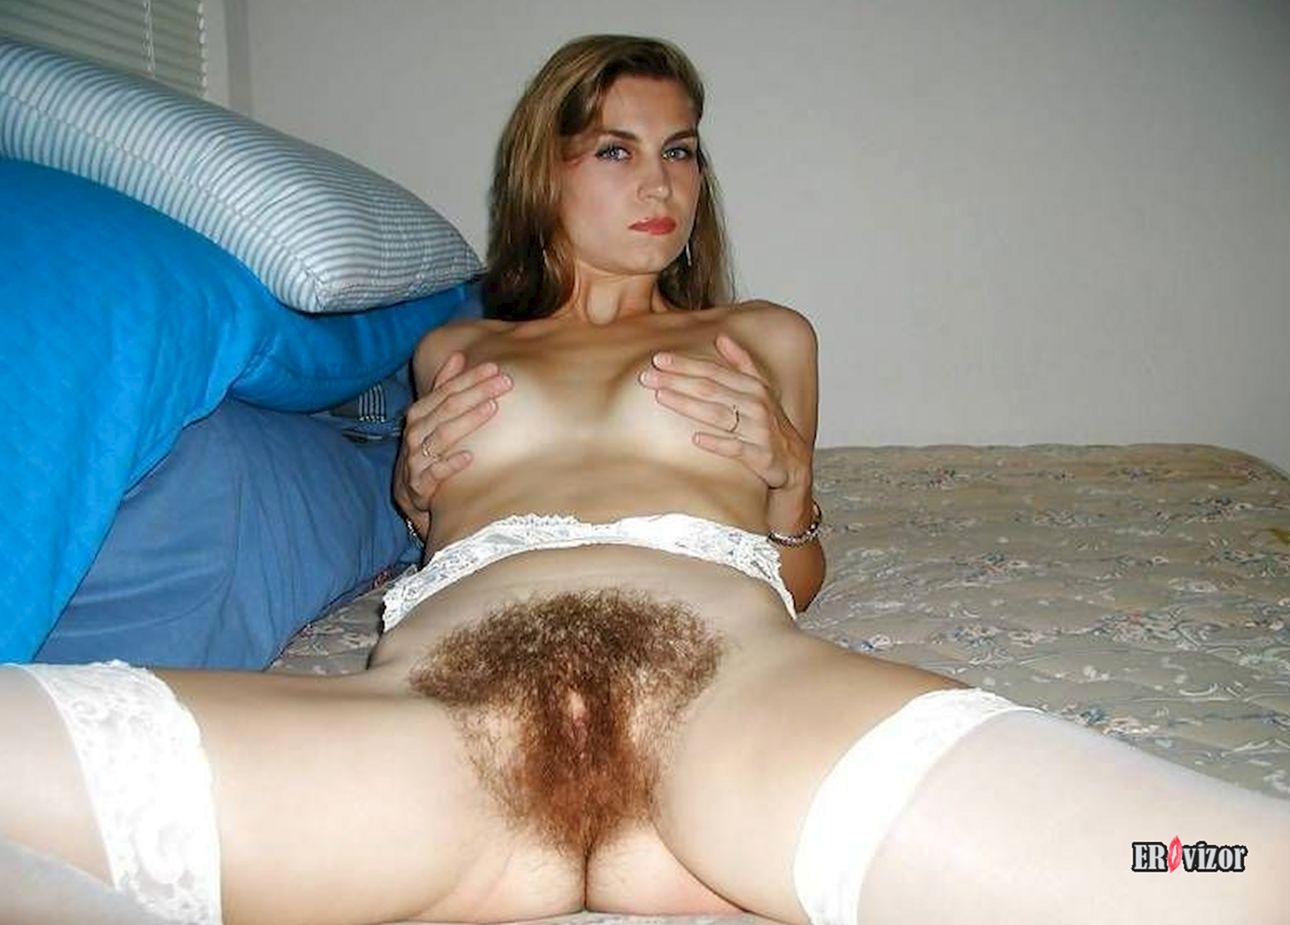 много волос в промежности девушки